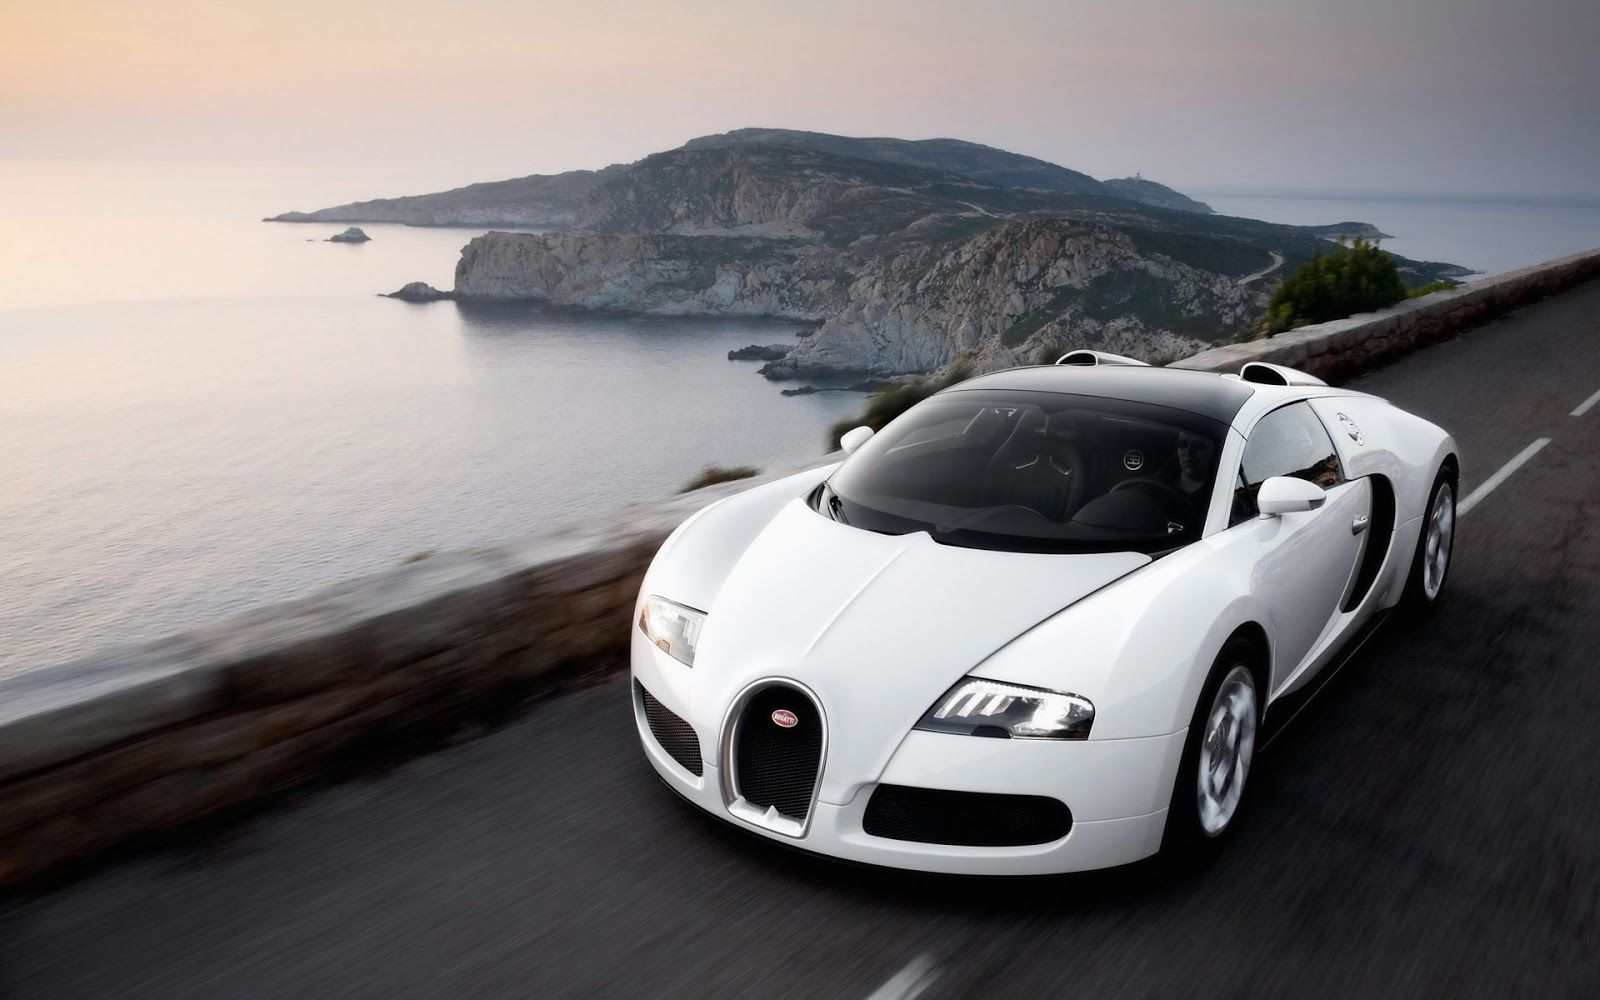 Charming Bugatti Veyron Super Sport 2013